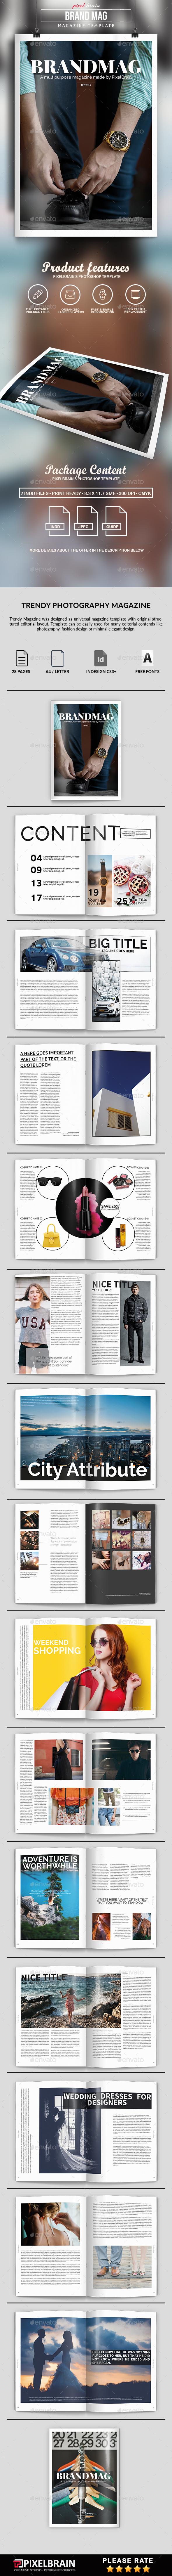 BrandMag Magazine - Magazines Print Templates